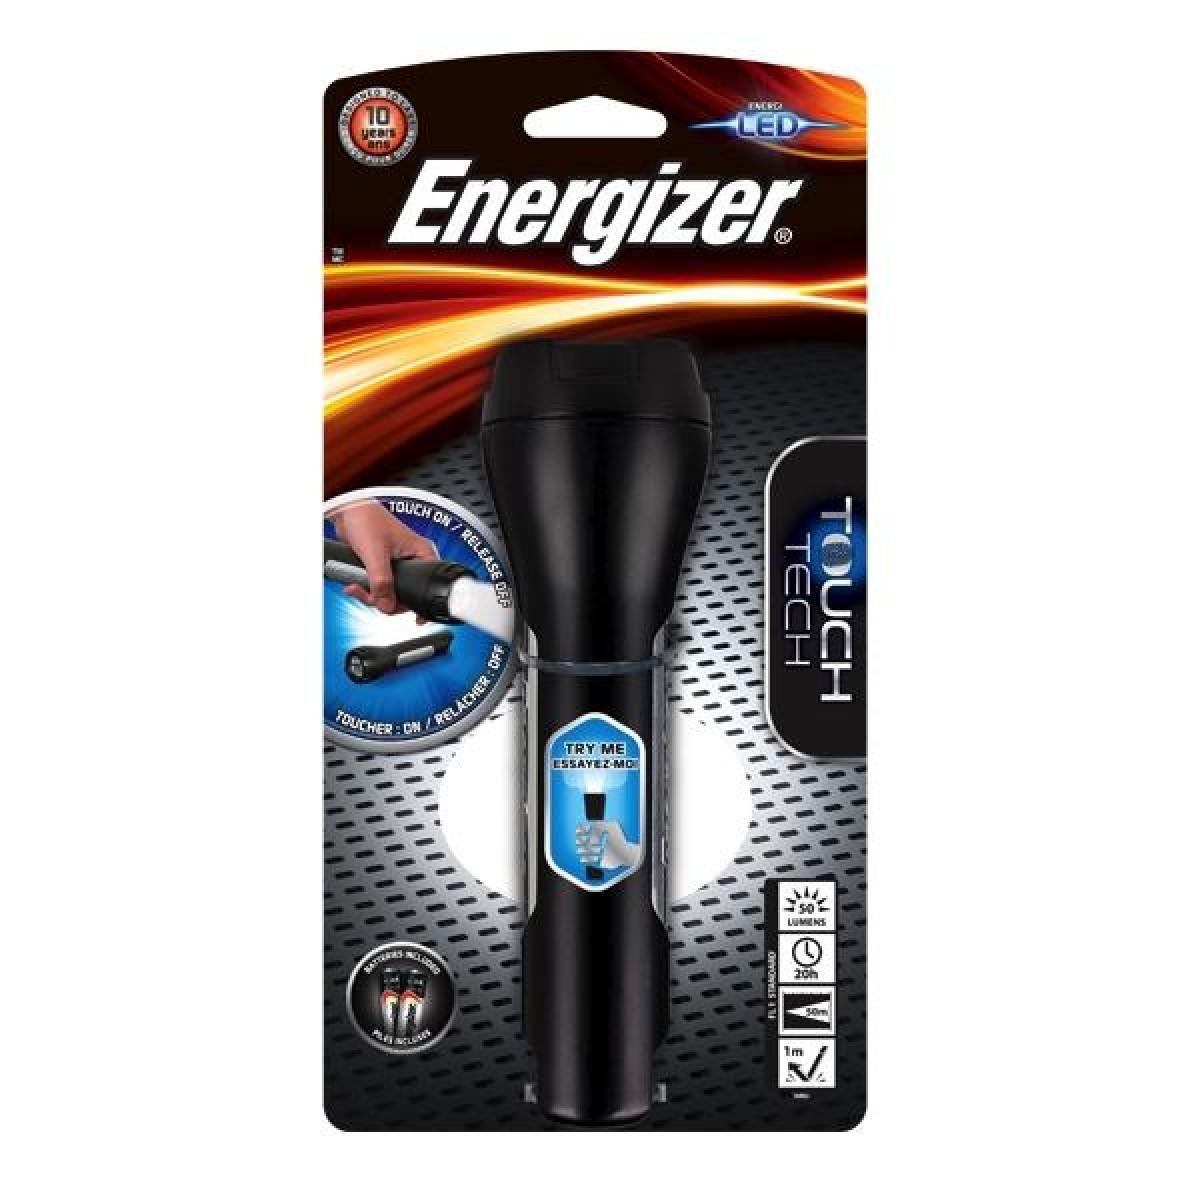 Energizer 2AA LED Touch 50L Light Flashlight THH21